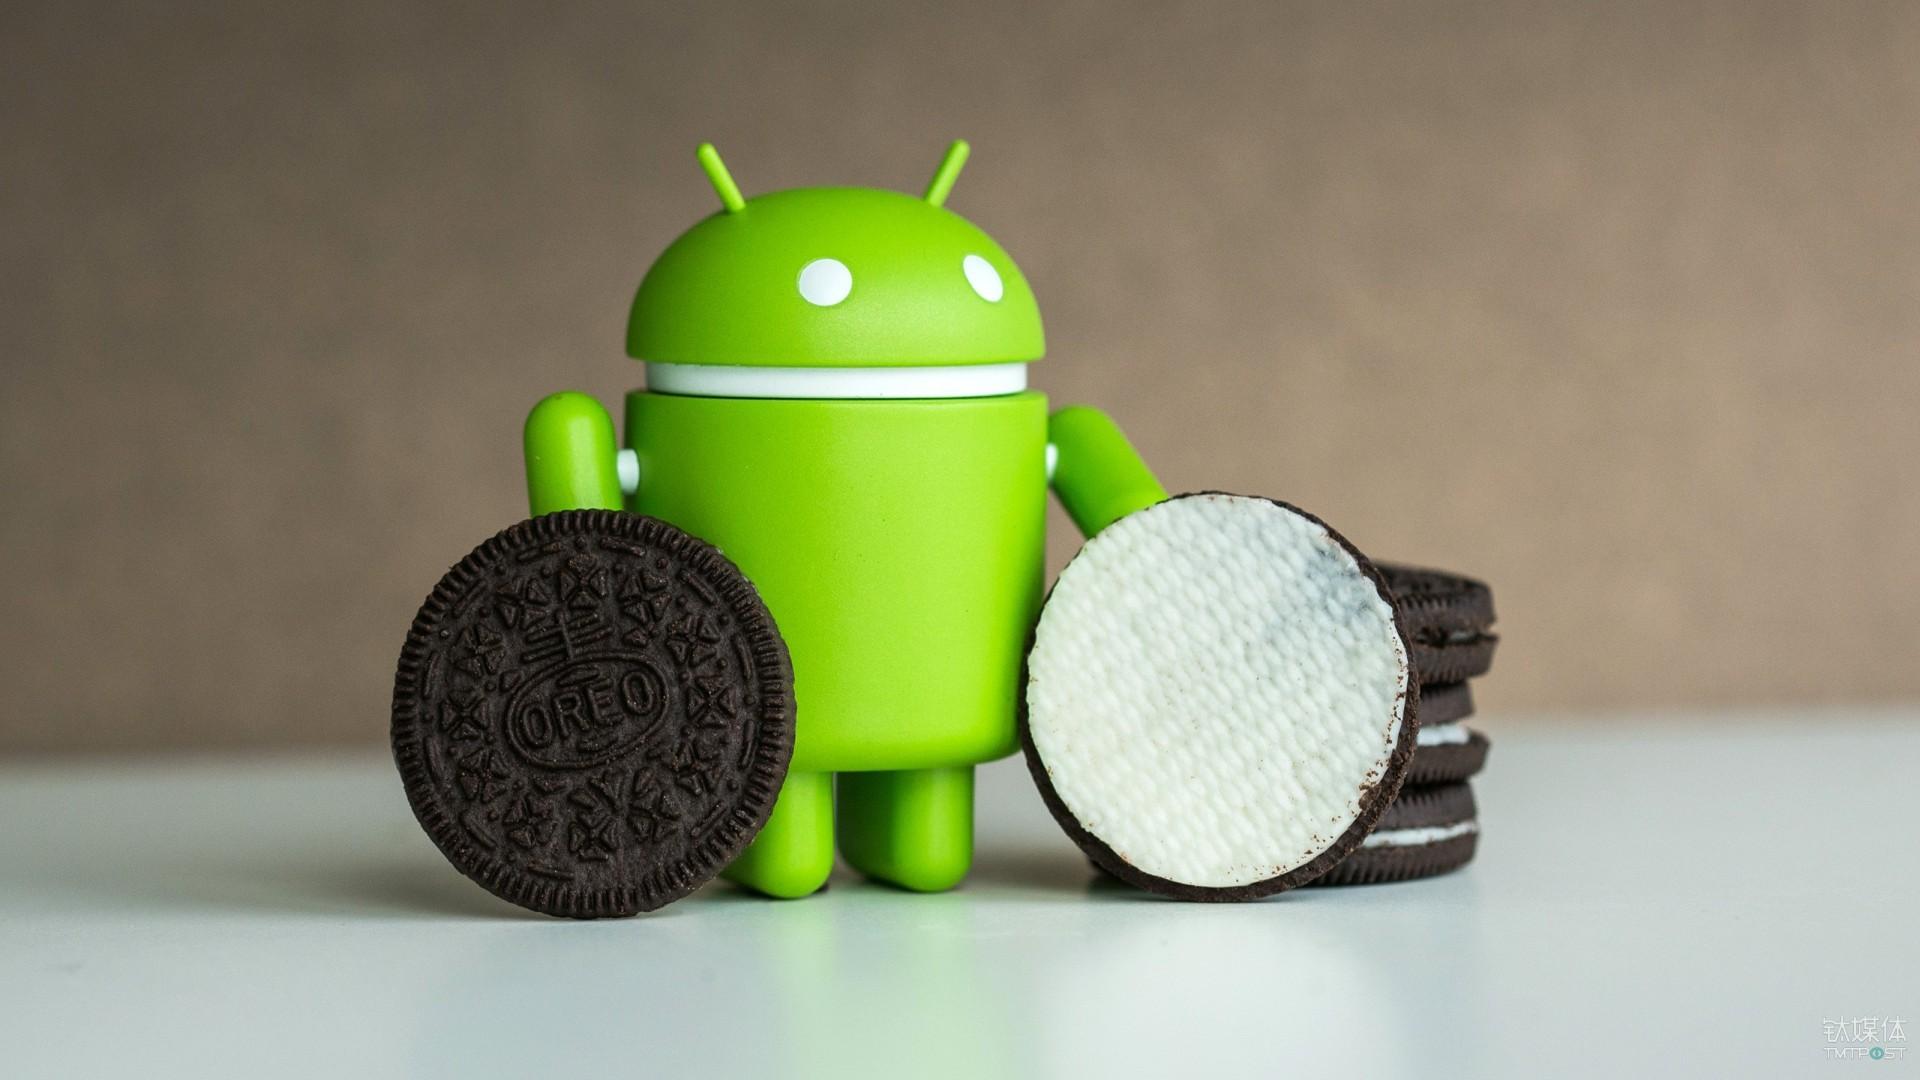 用上了新编码技术的 Android O